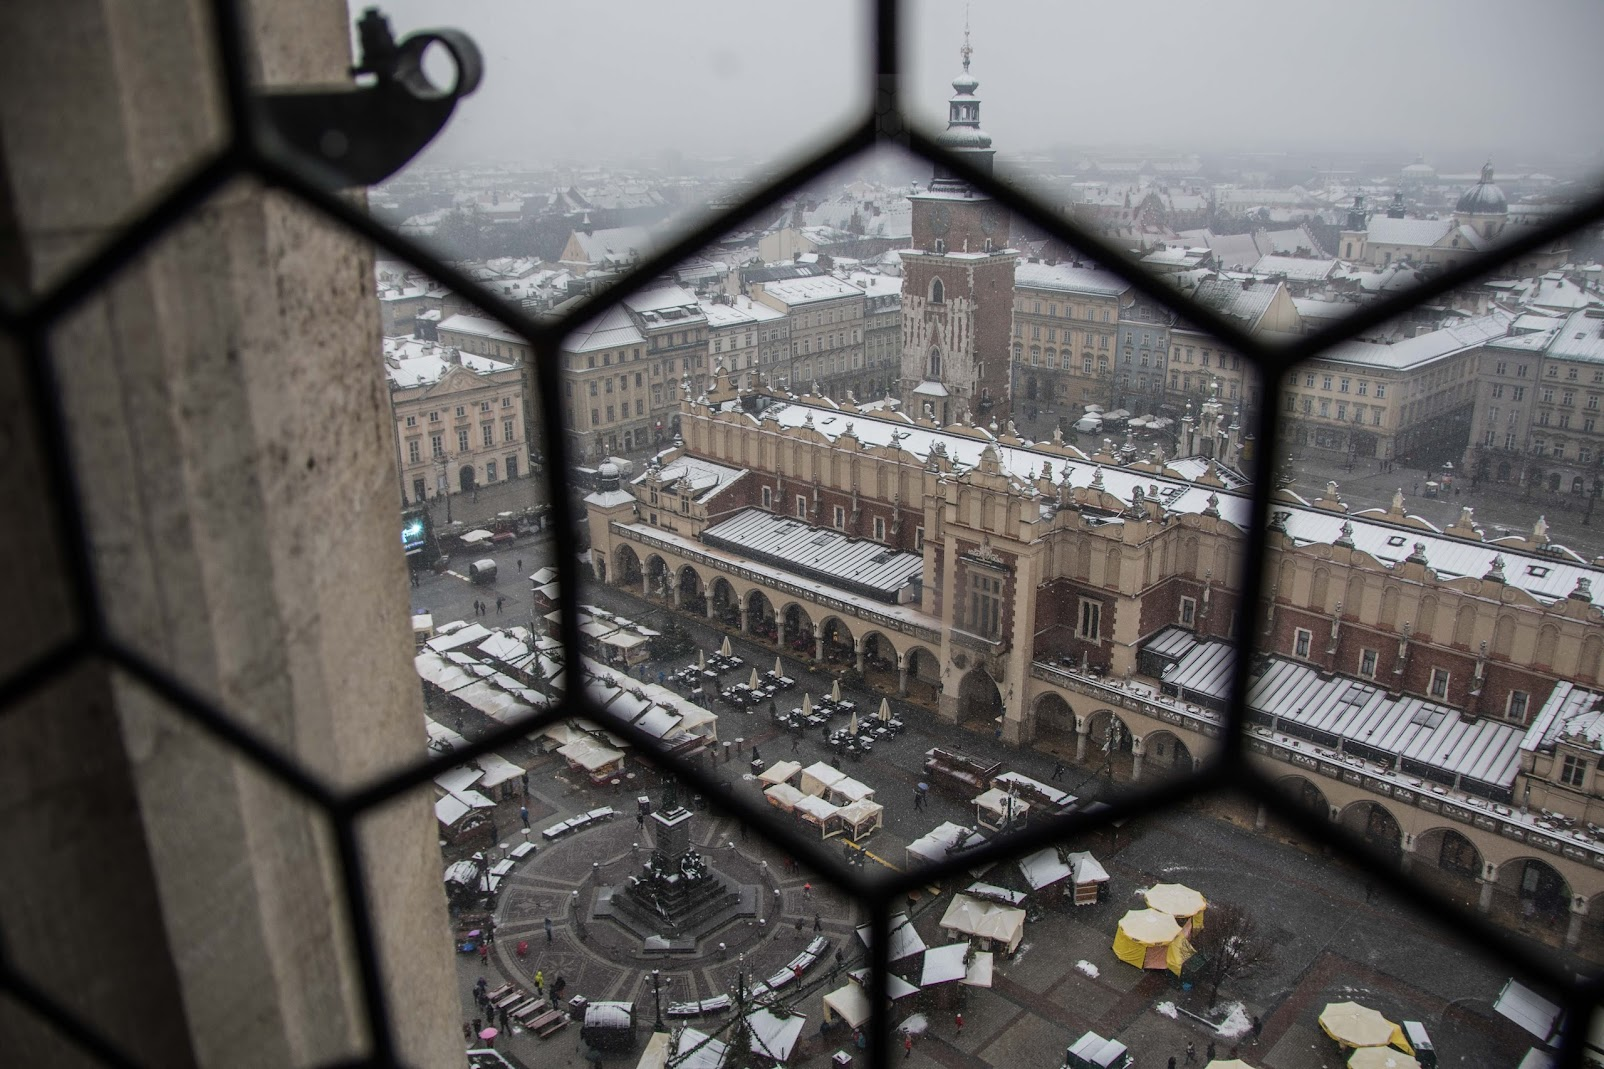 main market square krakow in winter